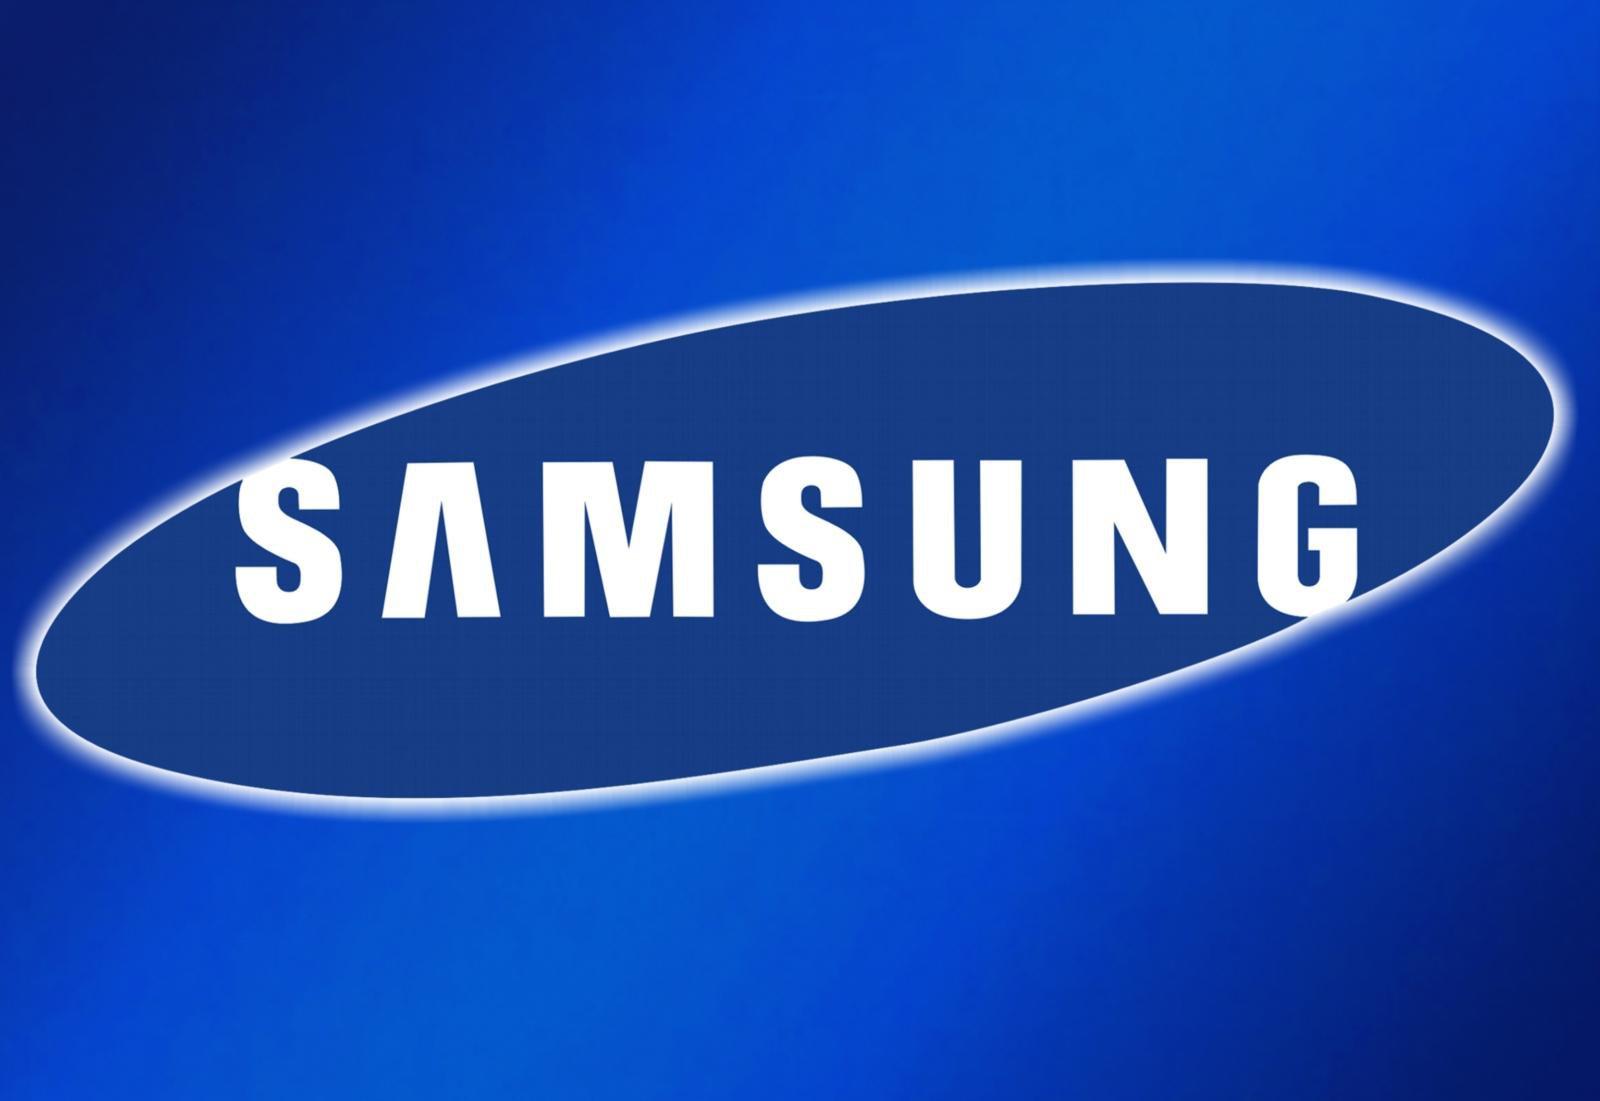 New Samsung Galaxy Tab 5 May Got 9.7-inch Display